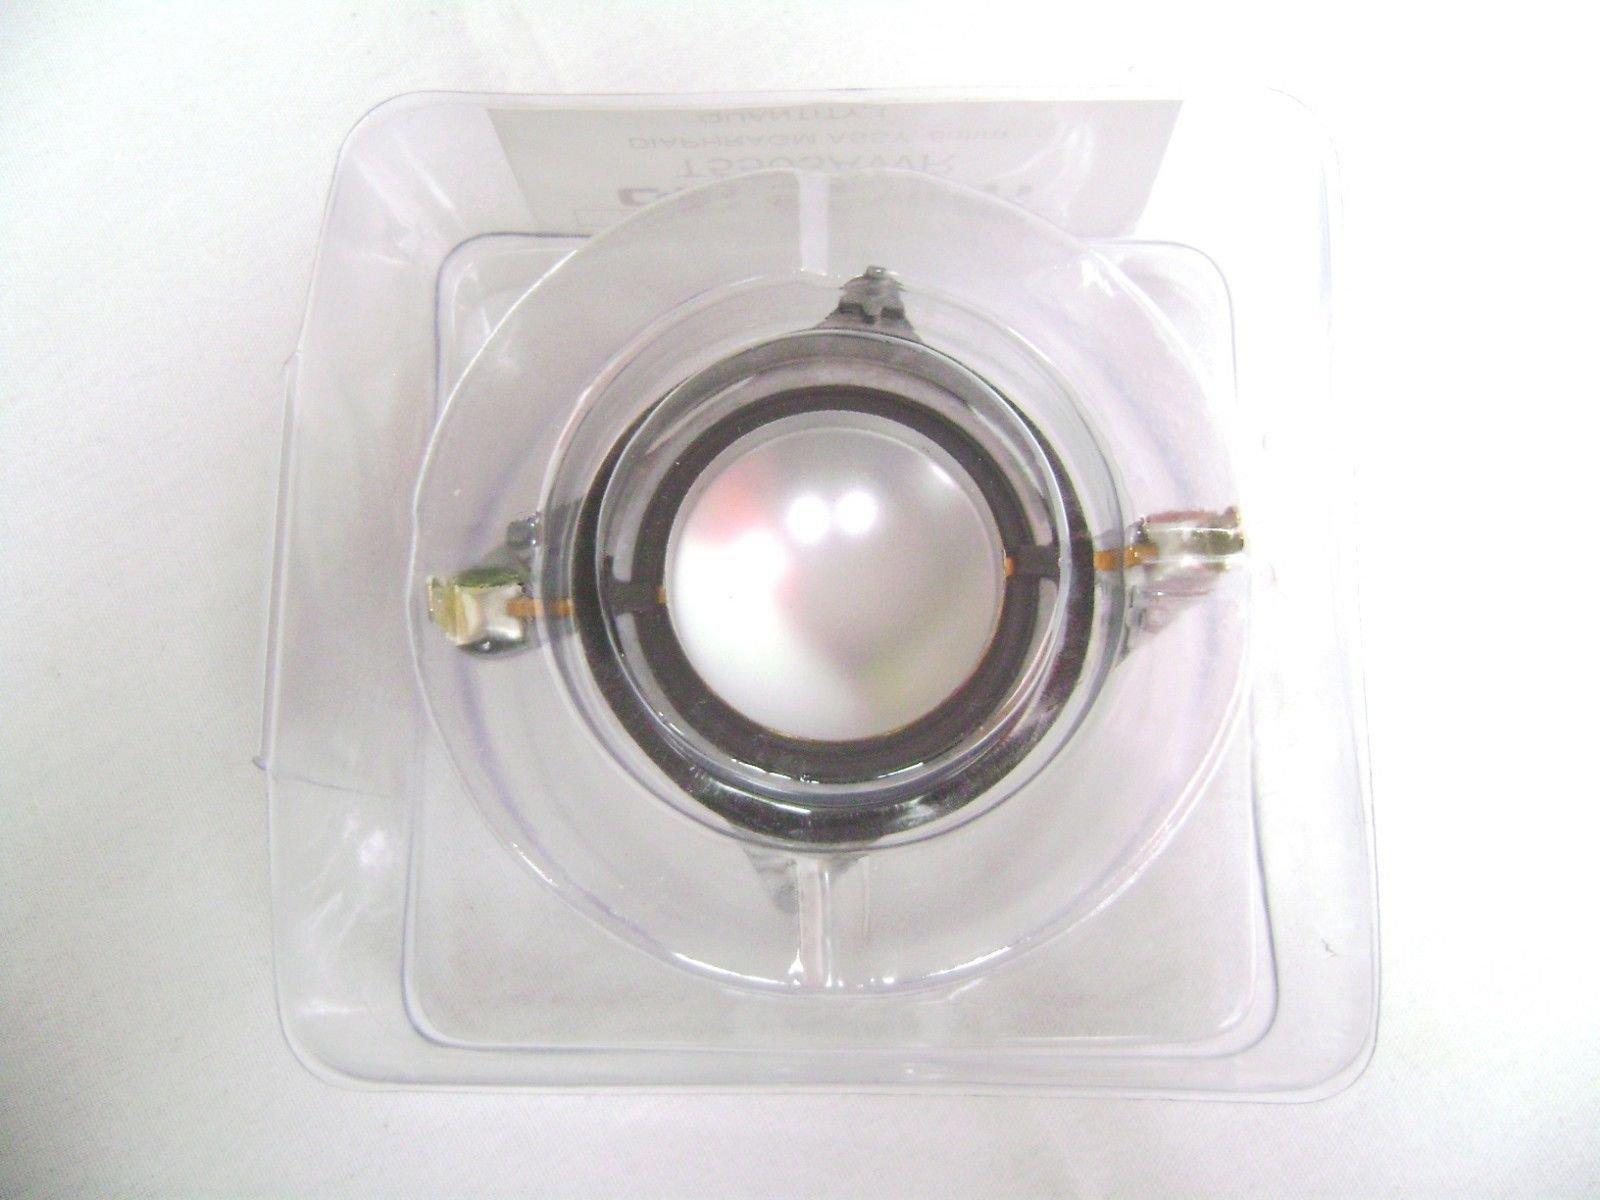 Original Celestion Diaphragm 8ohm T5503AWR for CDX1-1415/1425/1430, QSC-HPR QSC HPR122i, HPR153i, HPR153F & Yorkville NX300